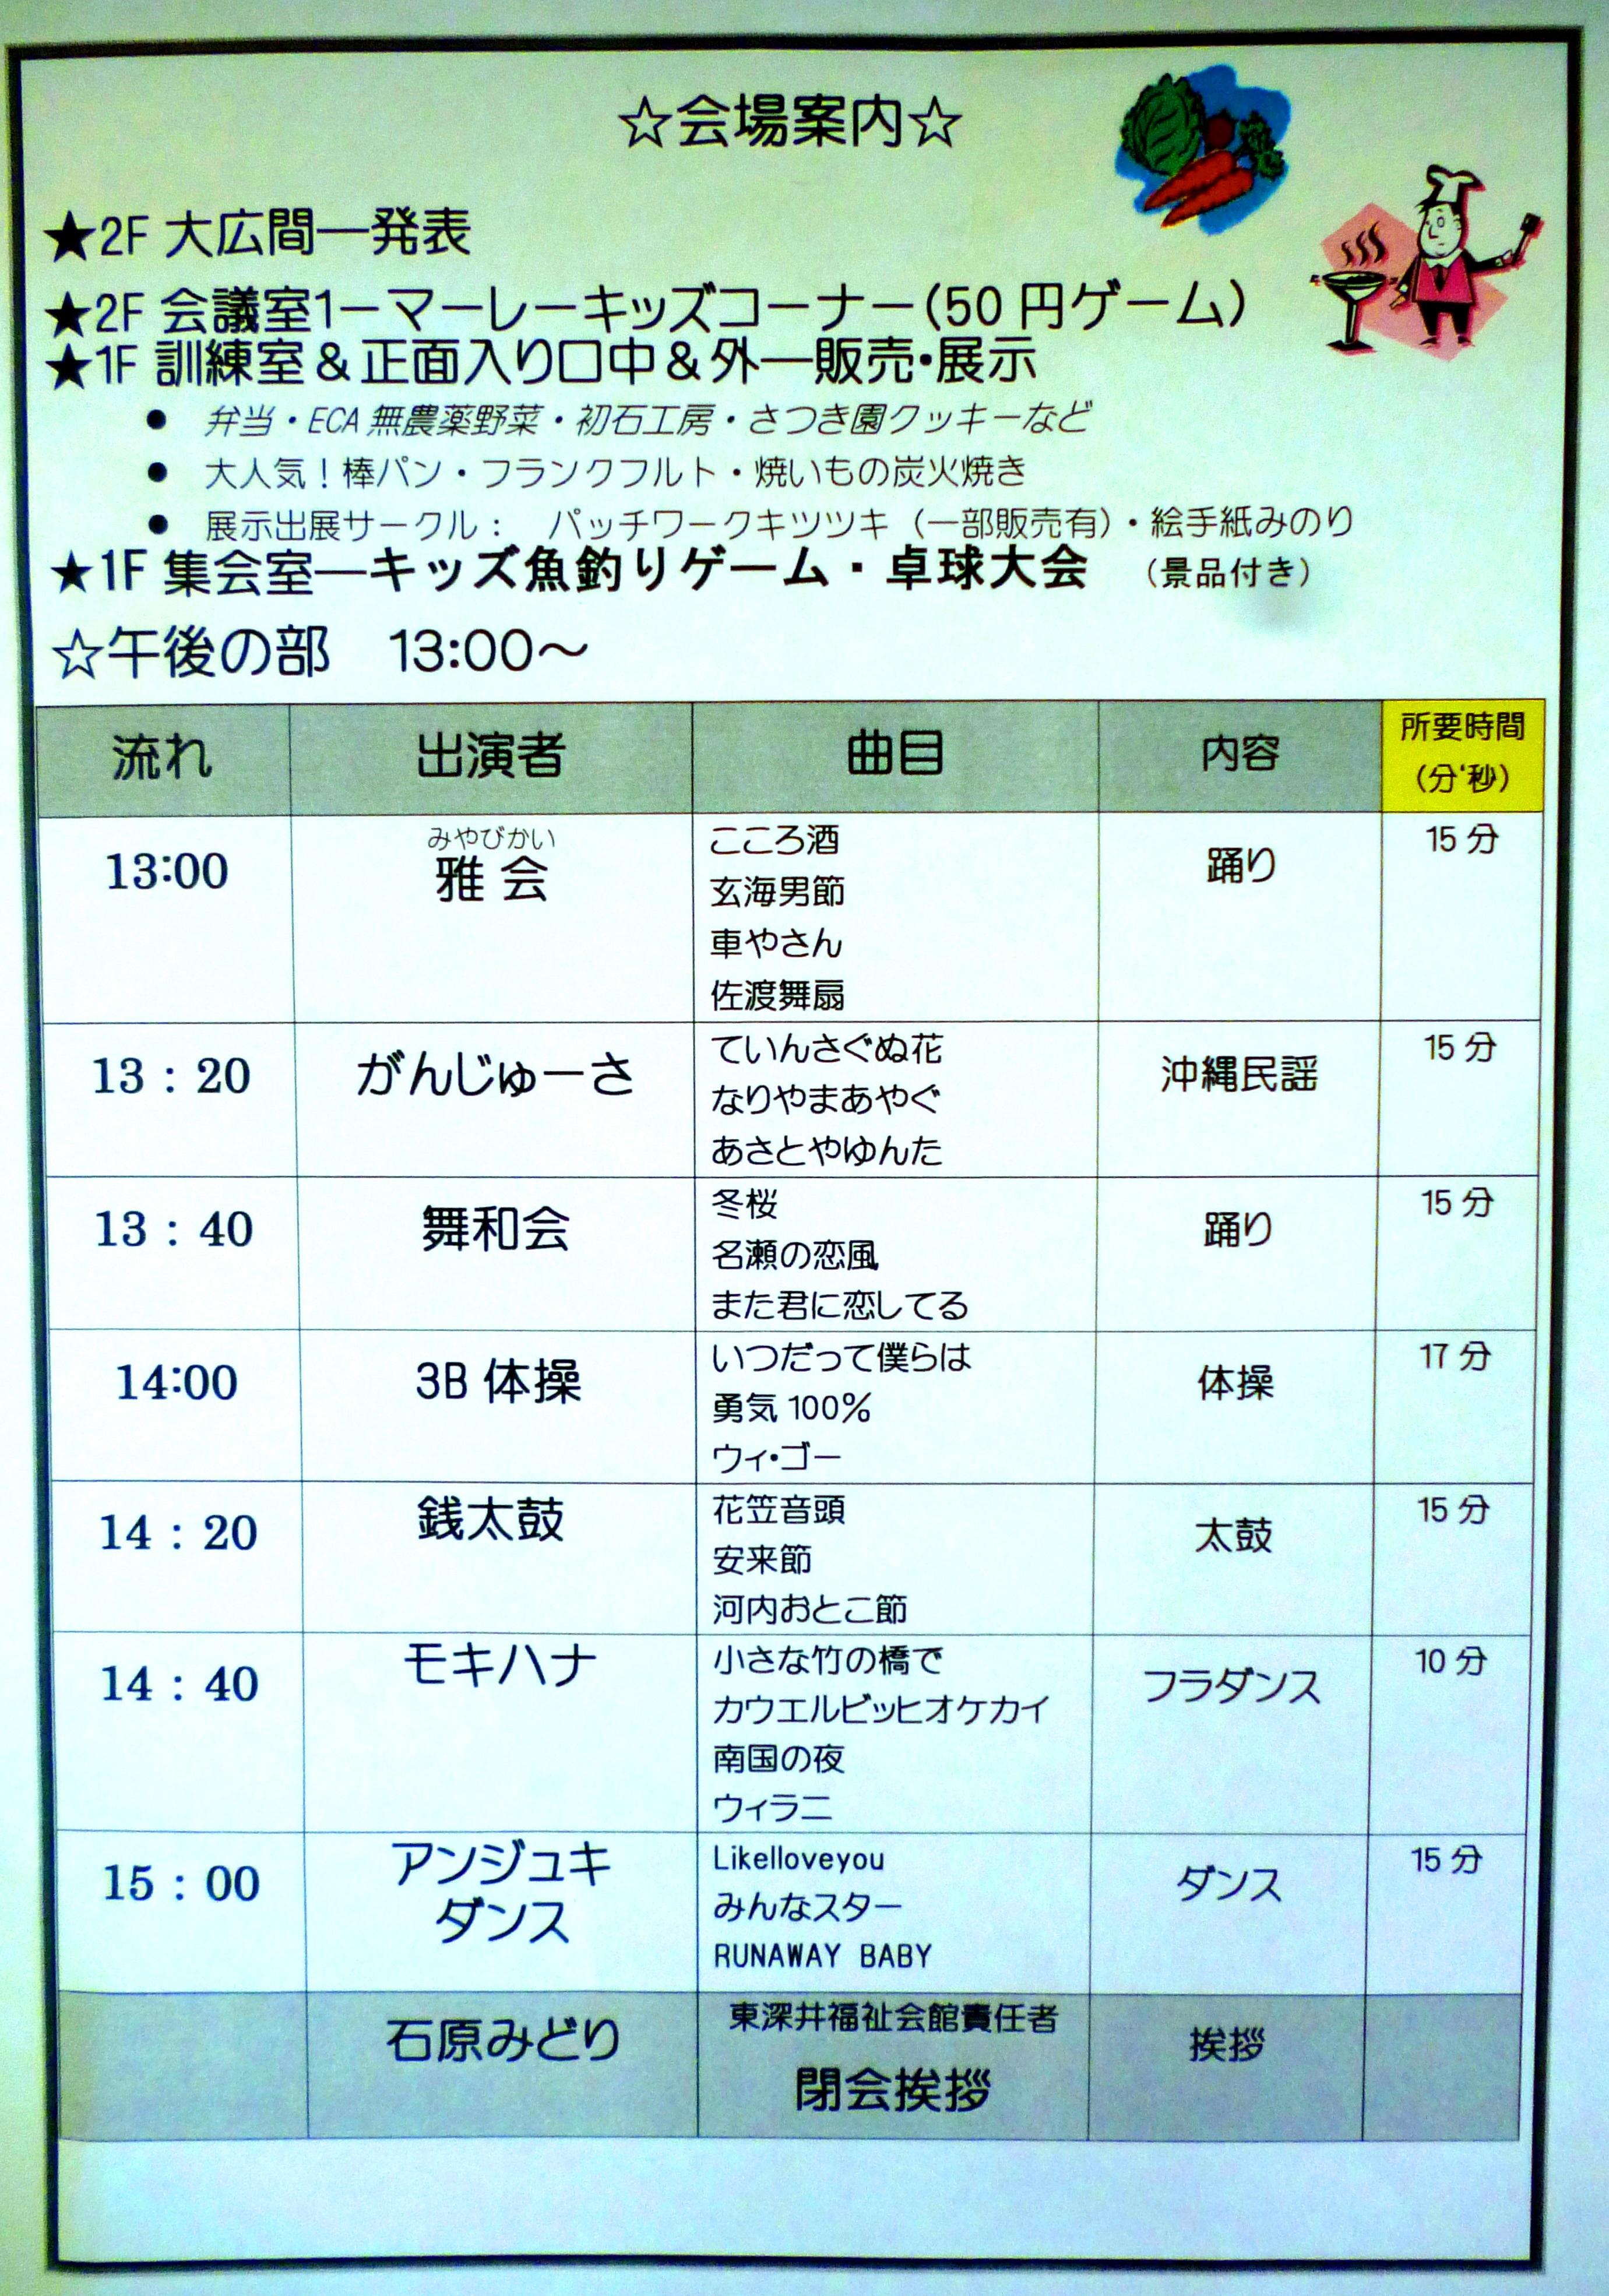 http://www.higashifukai-wh.org/news/2013/10/03/fest3/P1010145.JPG